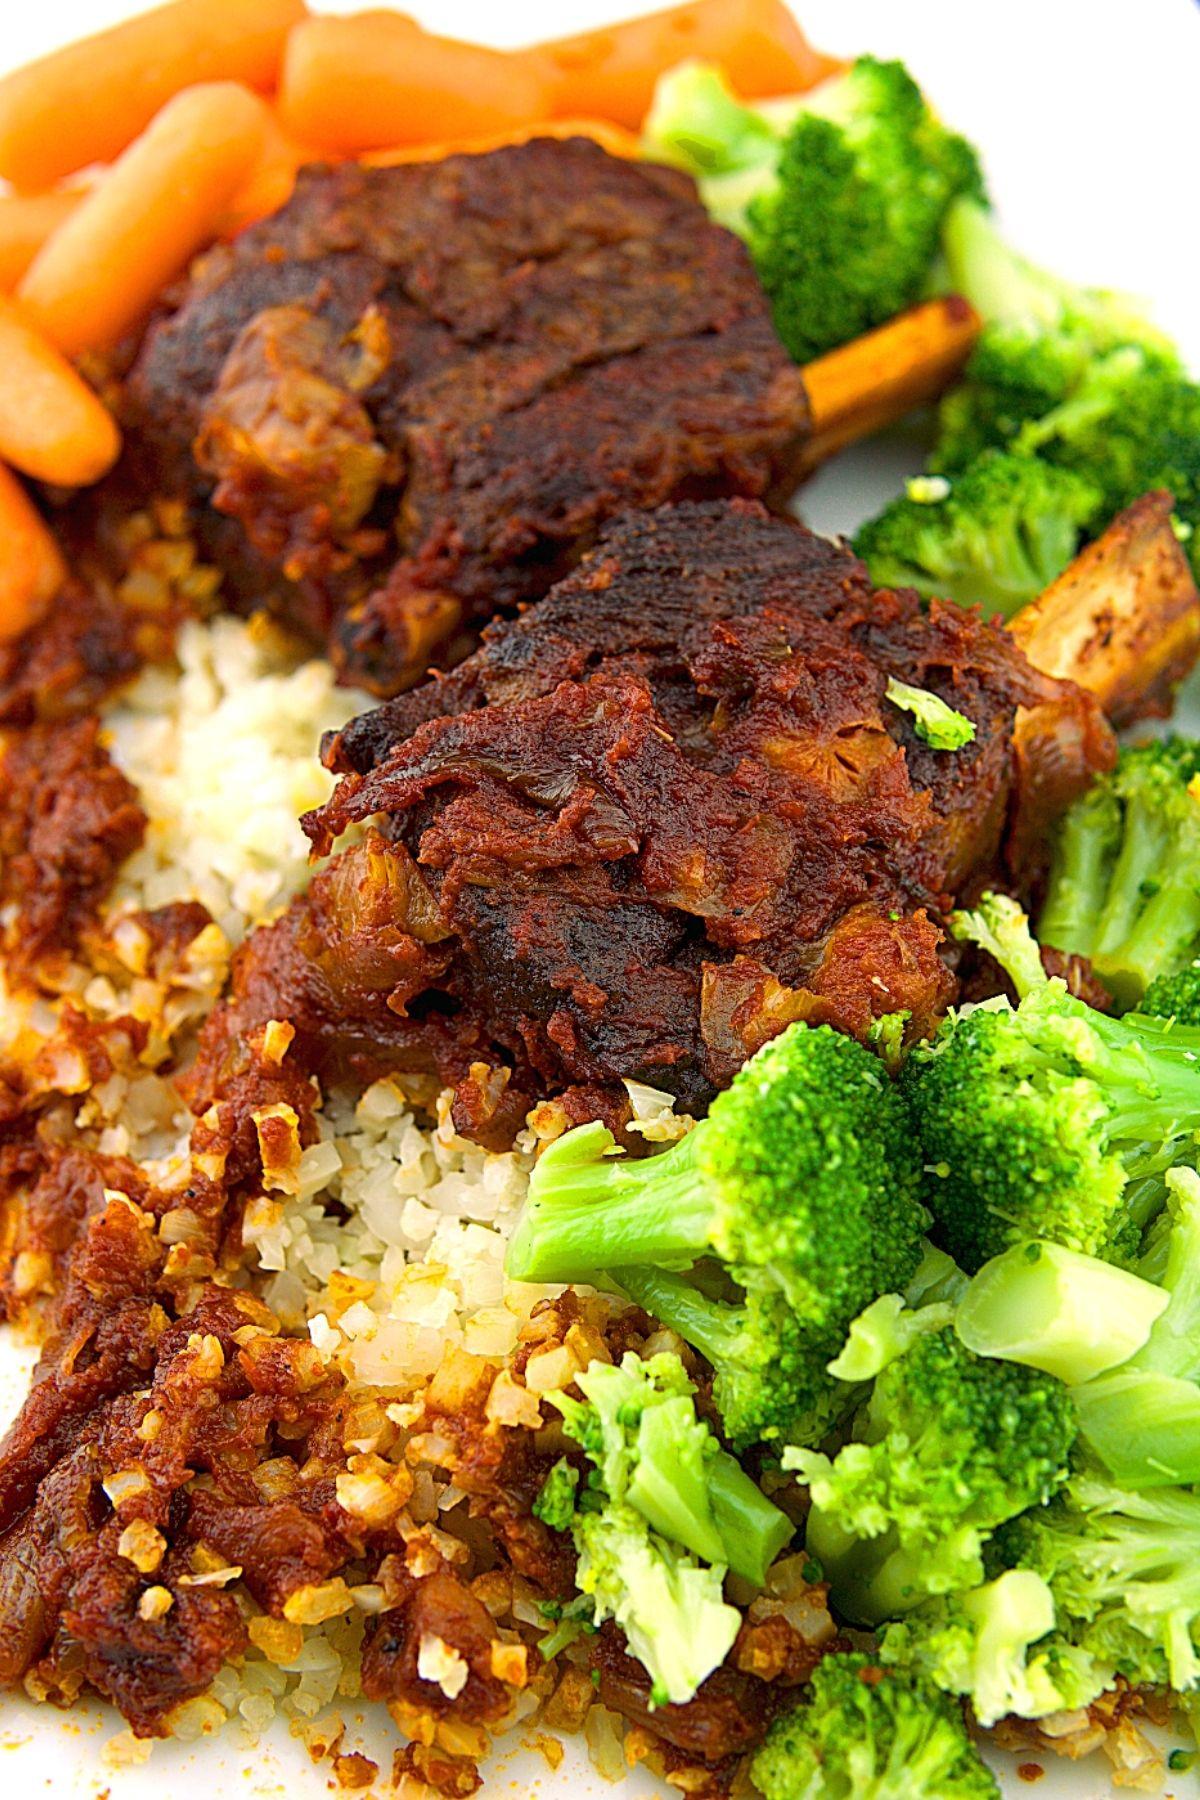 BBQ Braised Short Ribs Fall Off The Bone Beef Ribs Recipe 1 of 10